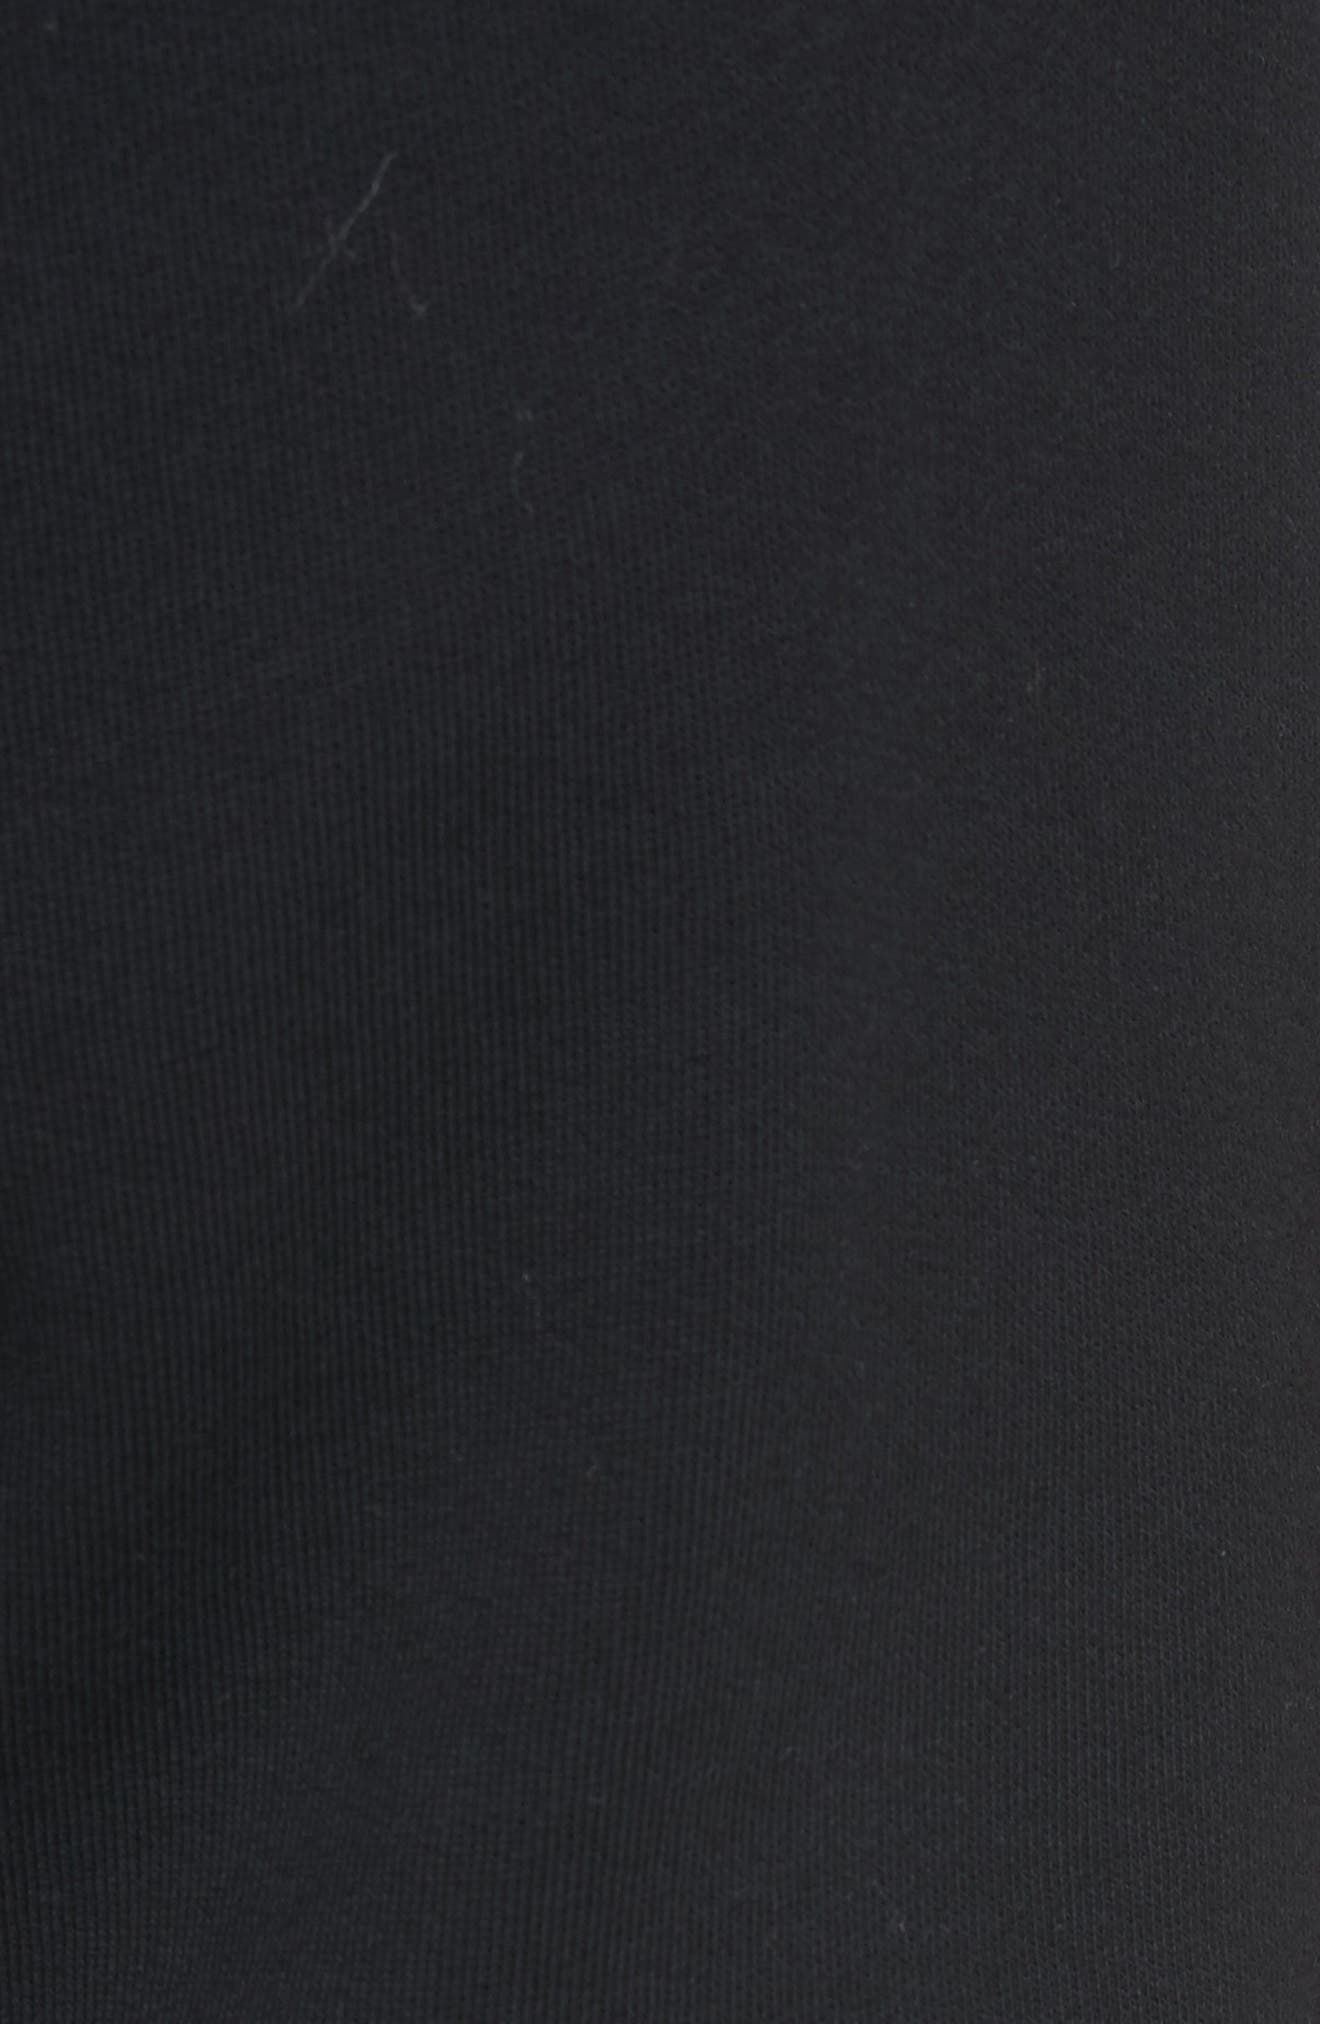 Nickford Lounge Pants,                             Alternate thumbnail 5, color,                             001